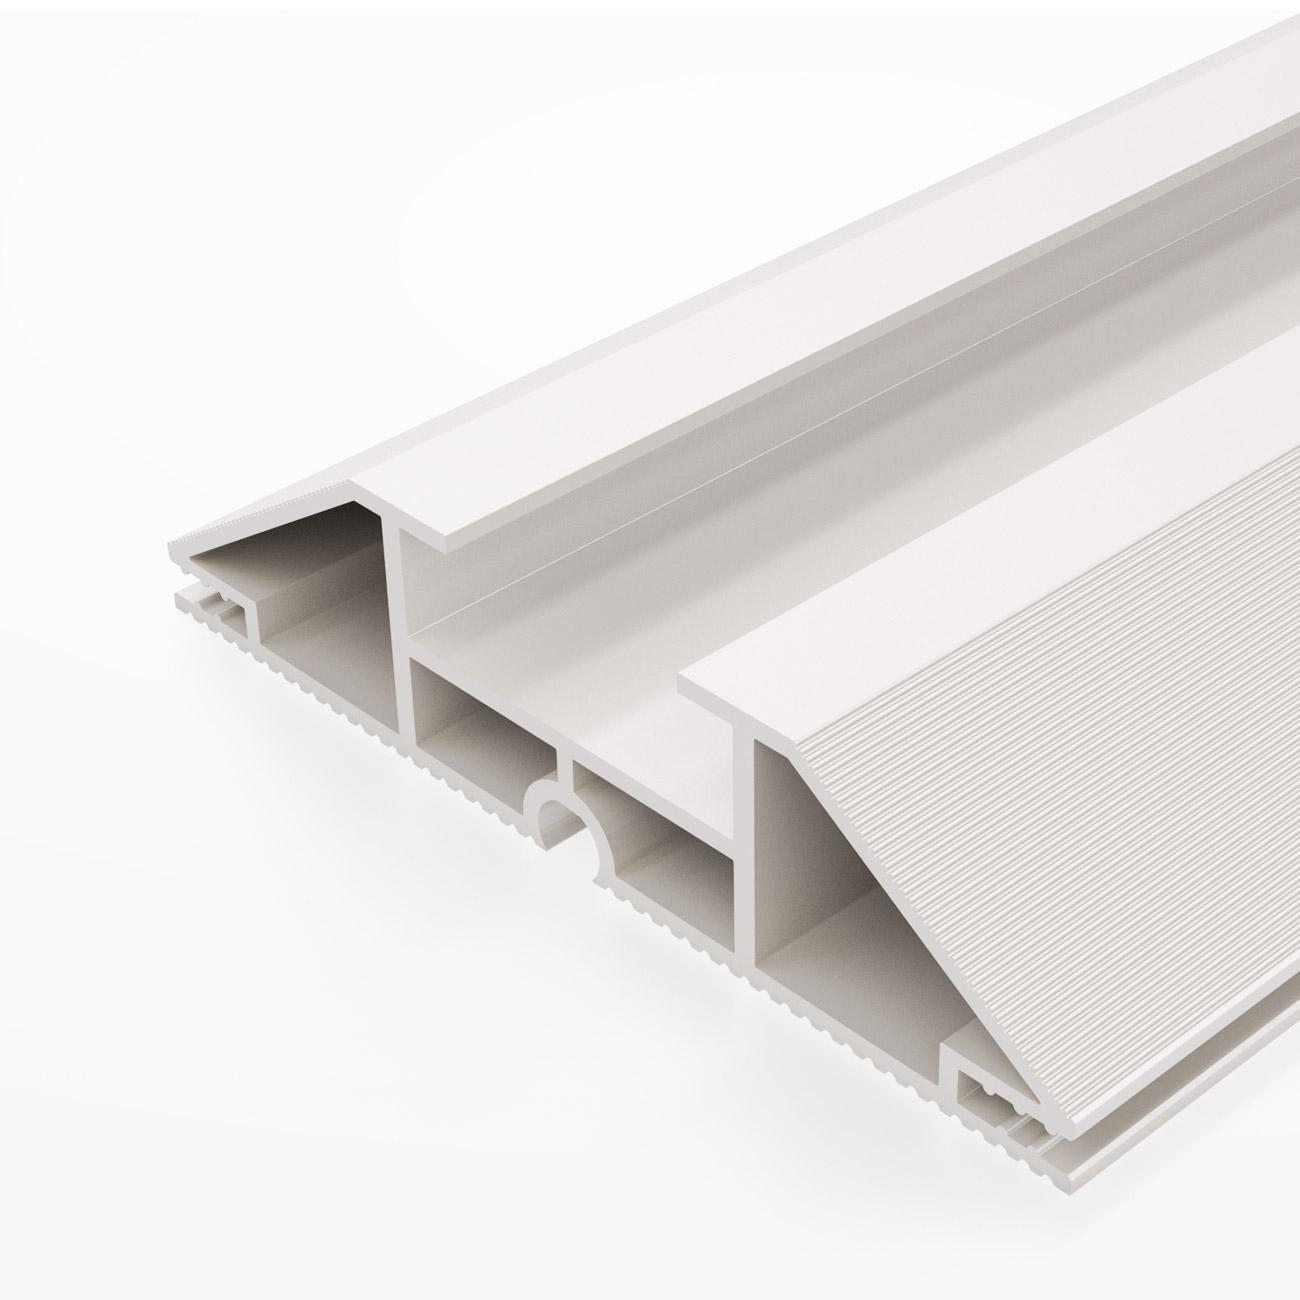 AGM Pixlip ABS Plastic Frames